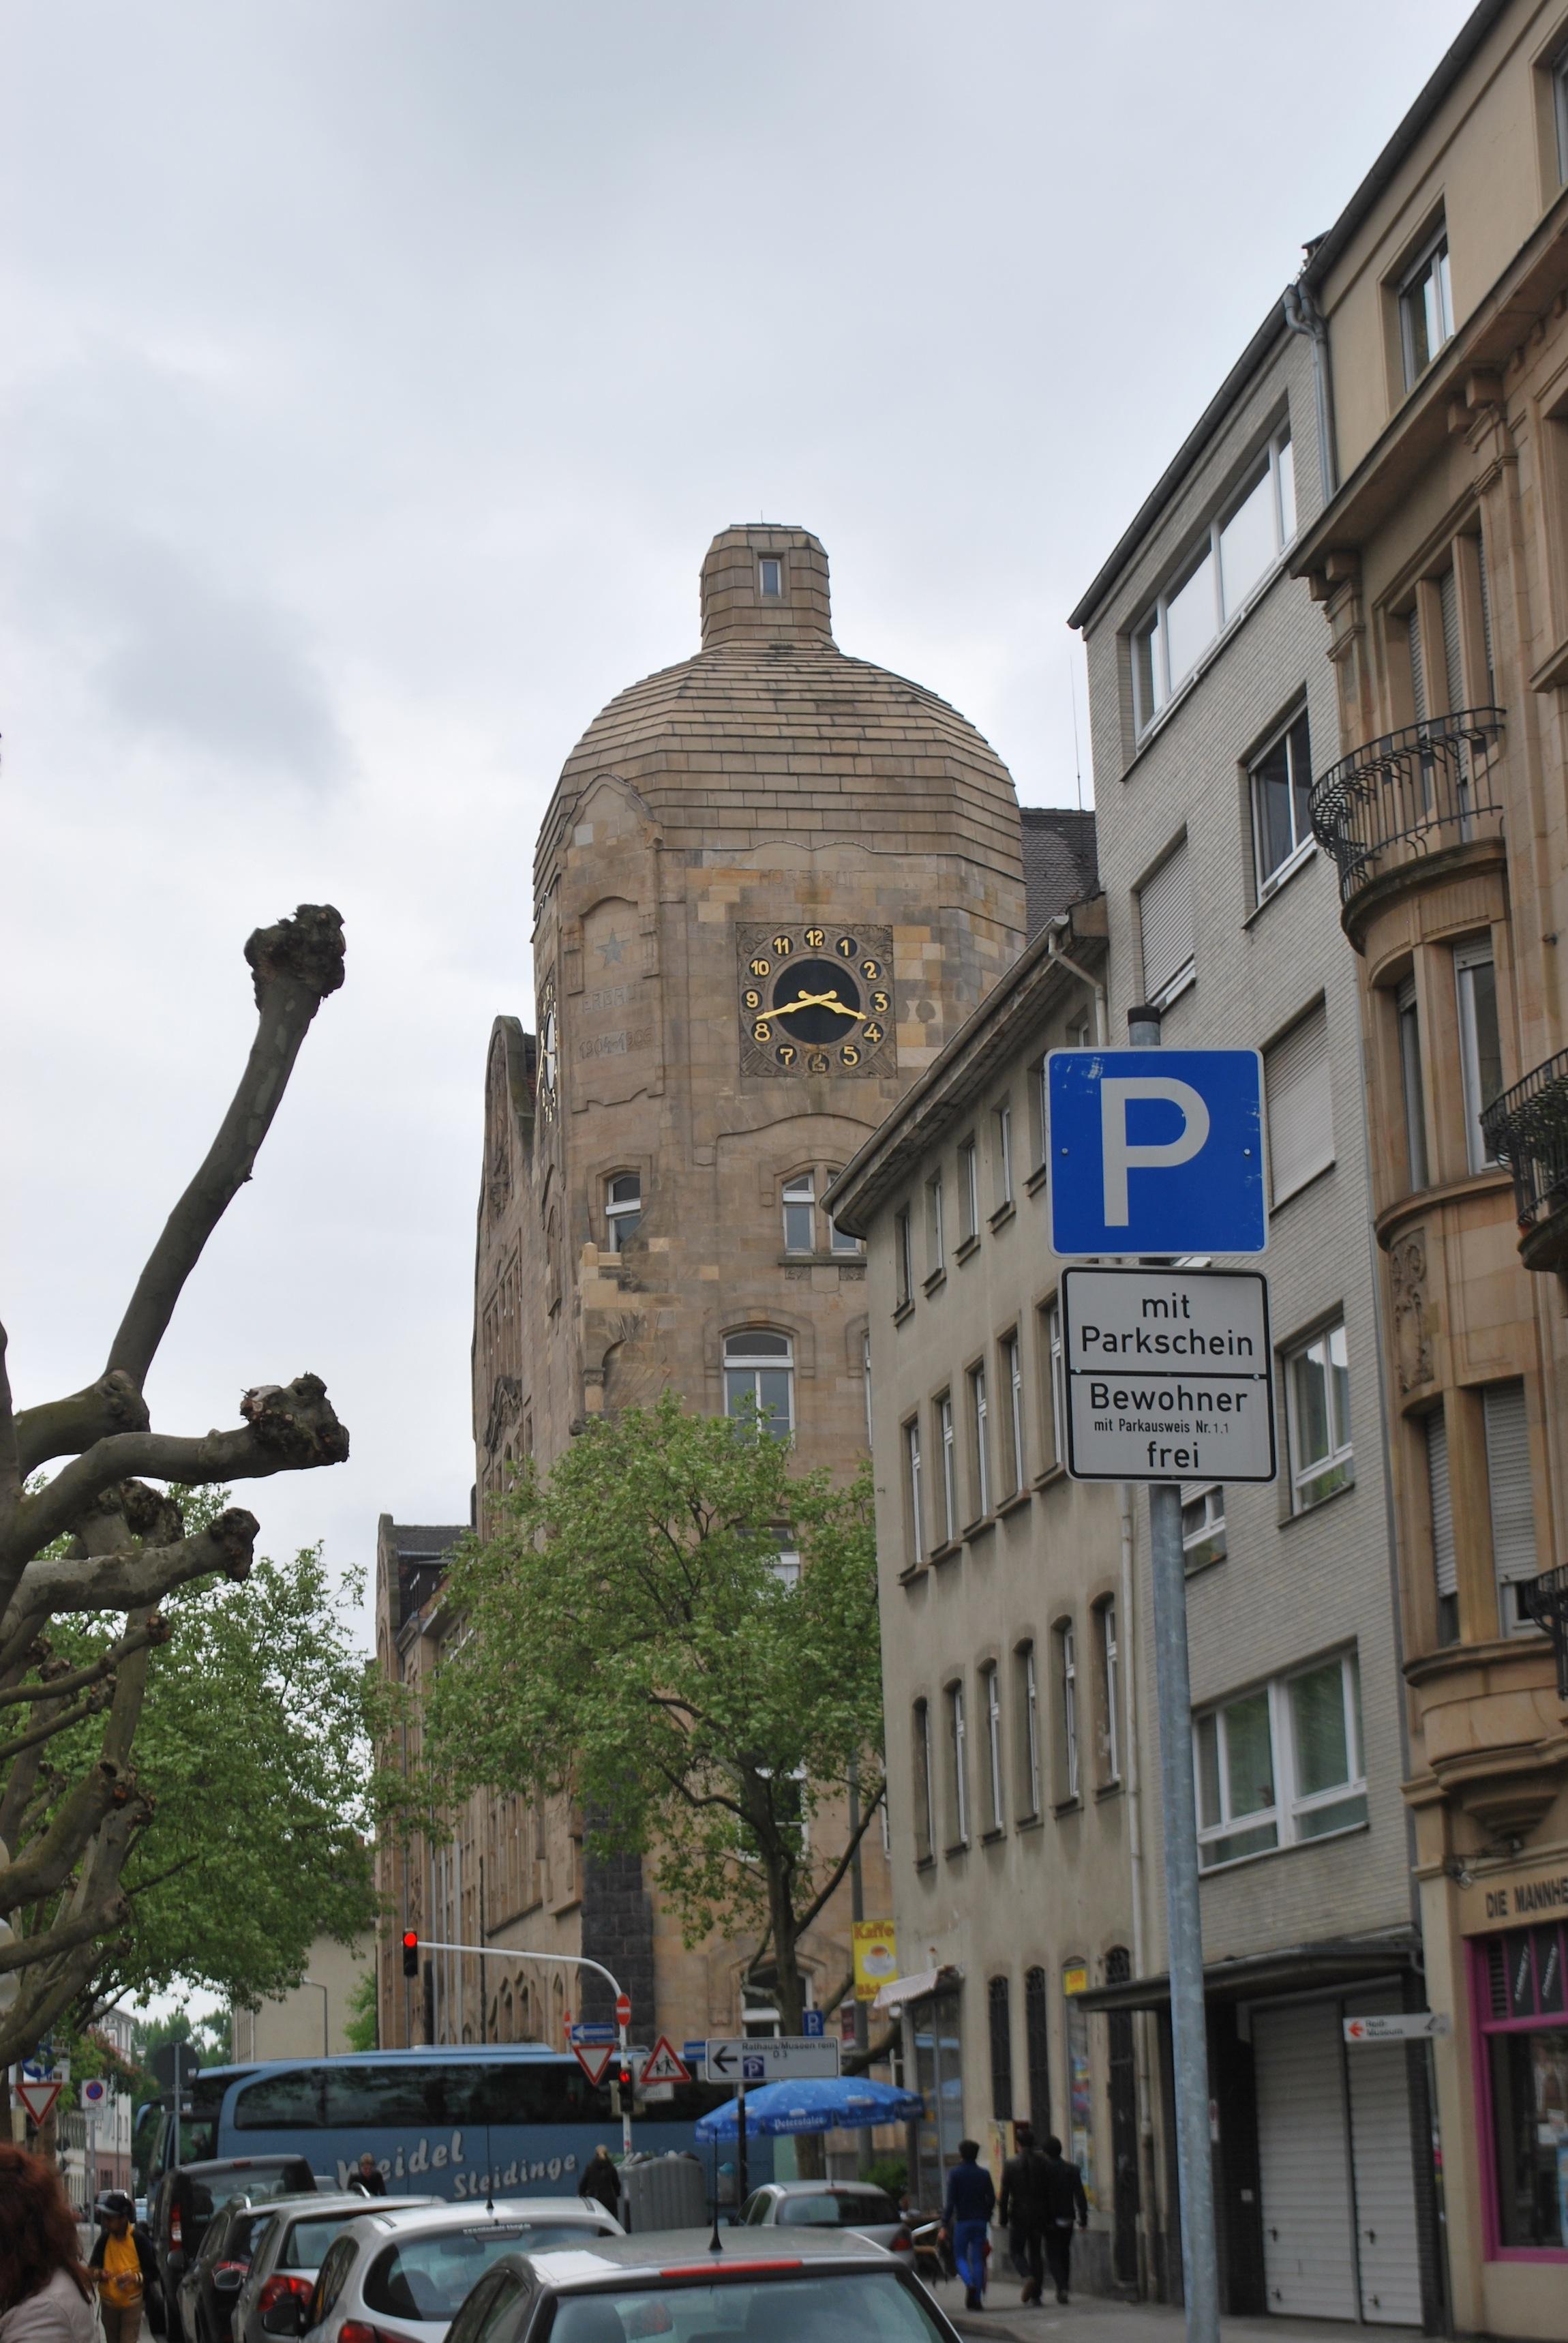 mannheim street scene